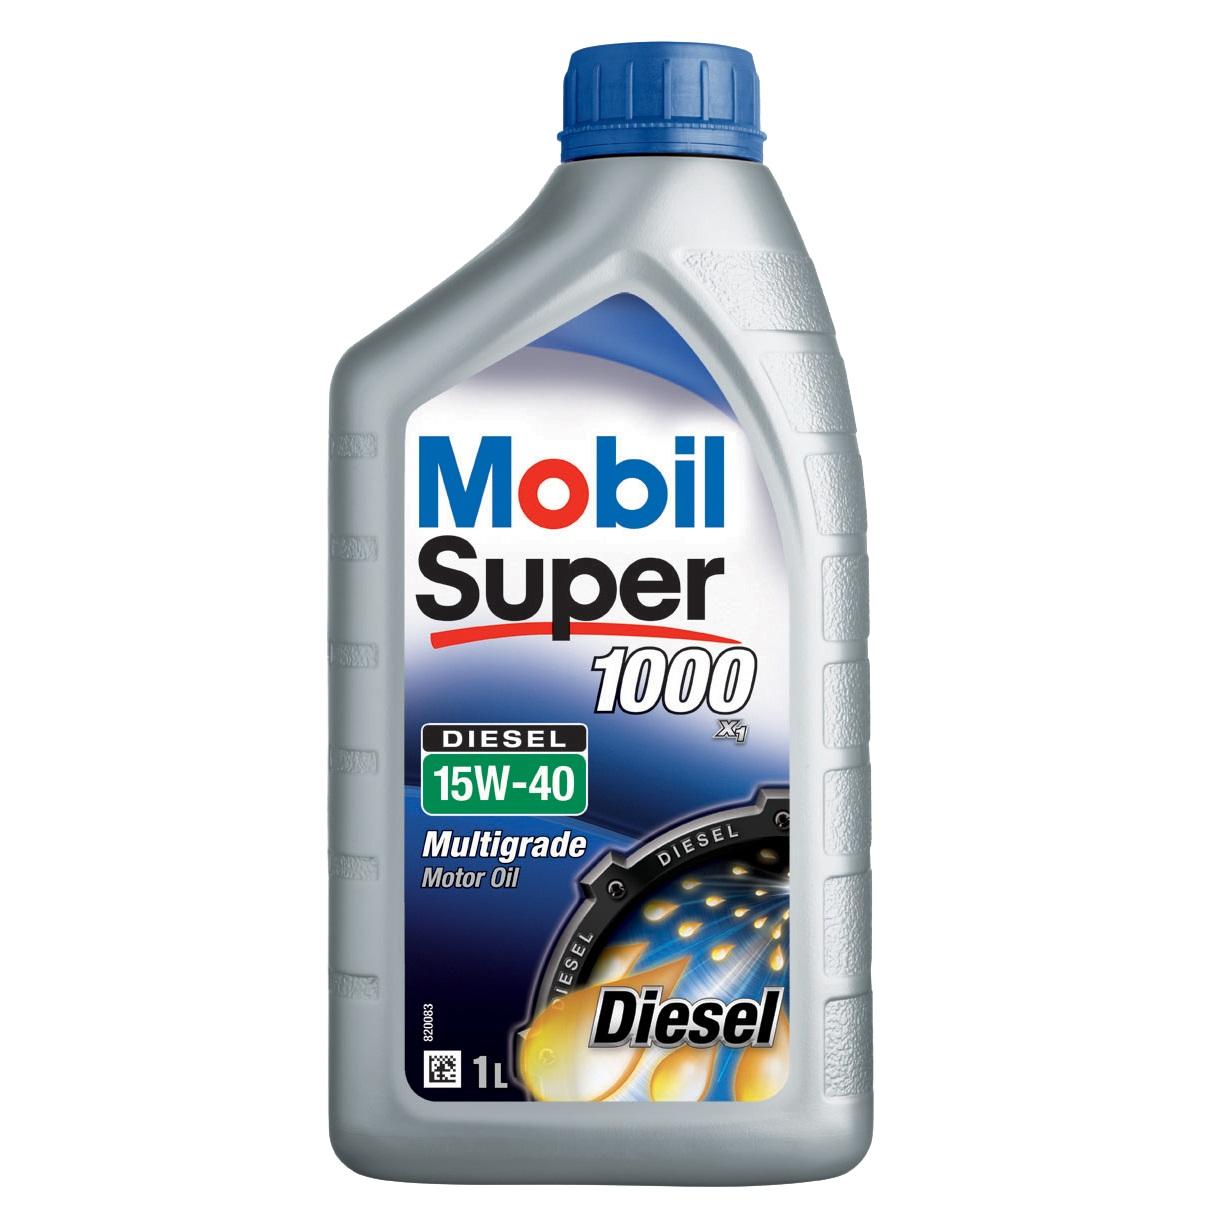 ULEI MOTOR MOBIL SUPER 1000 X1 DIESEL 15W40 1L